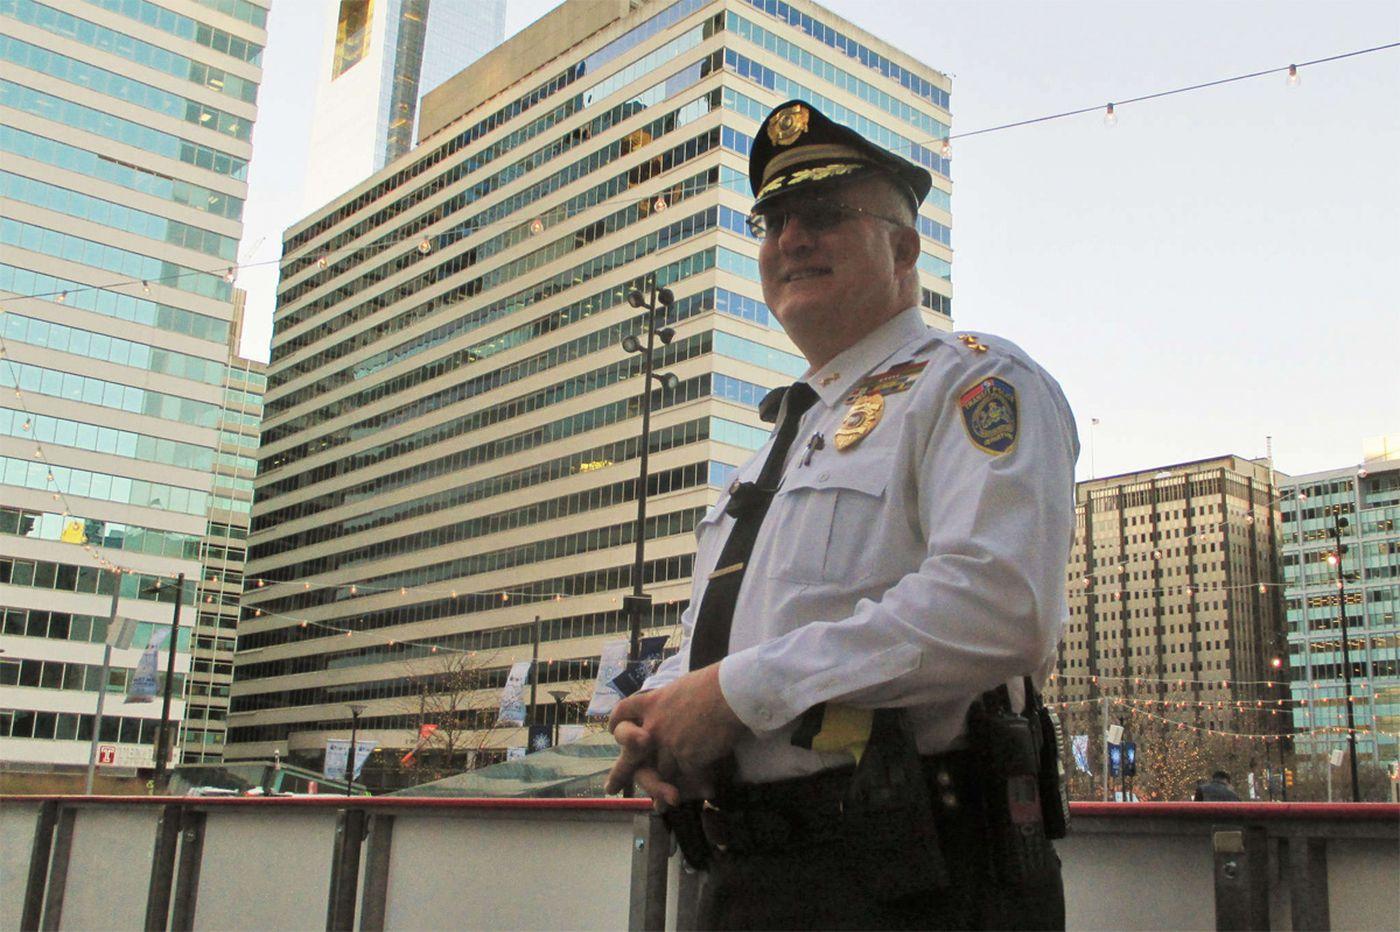 SEPTA police chief Nestel adds social-media savvy to traditional policing